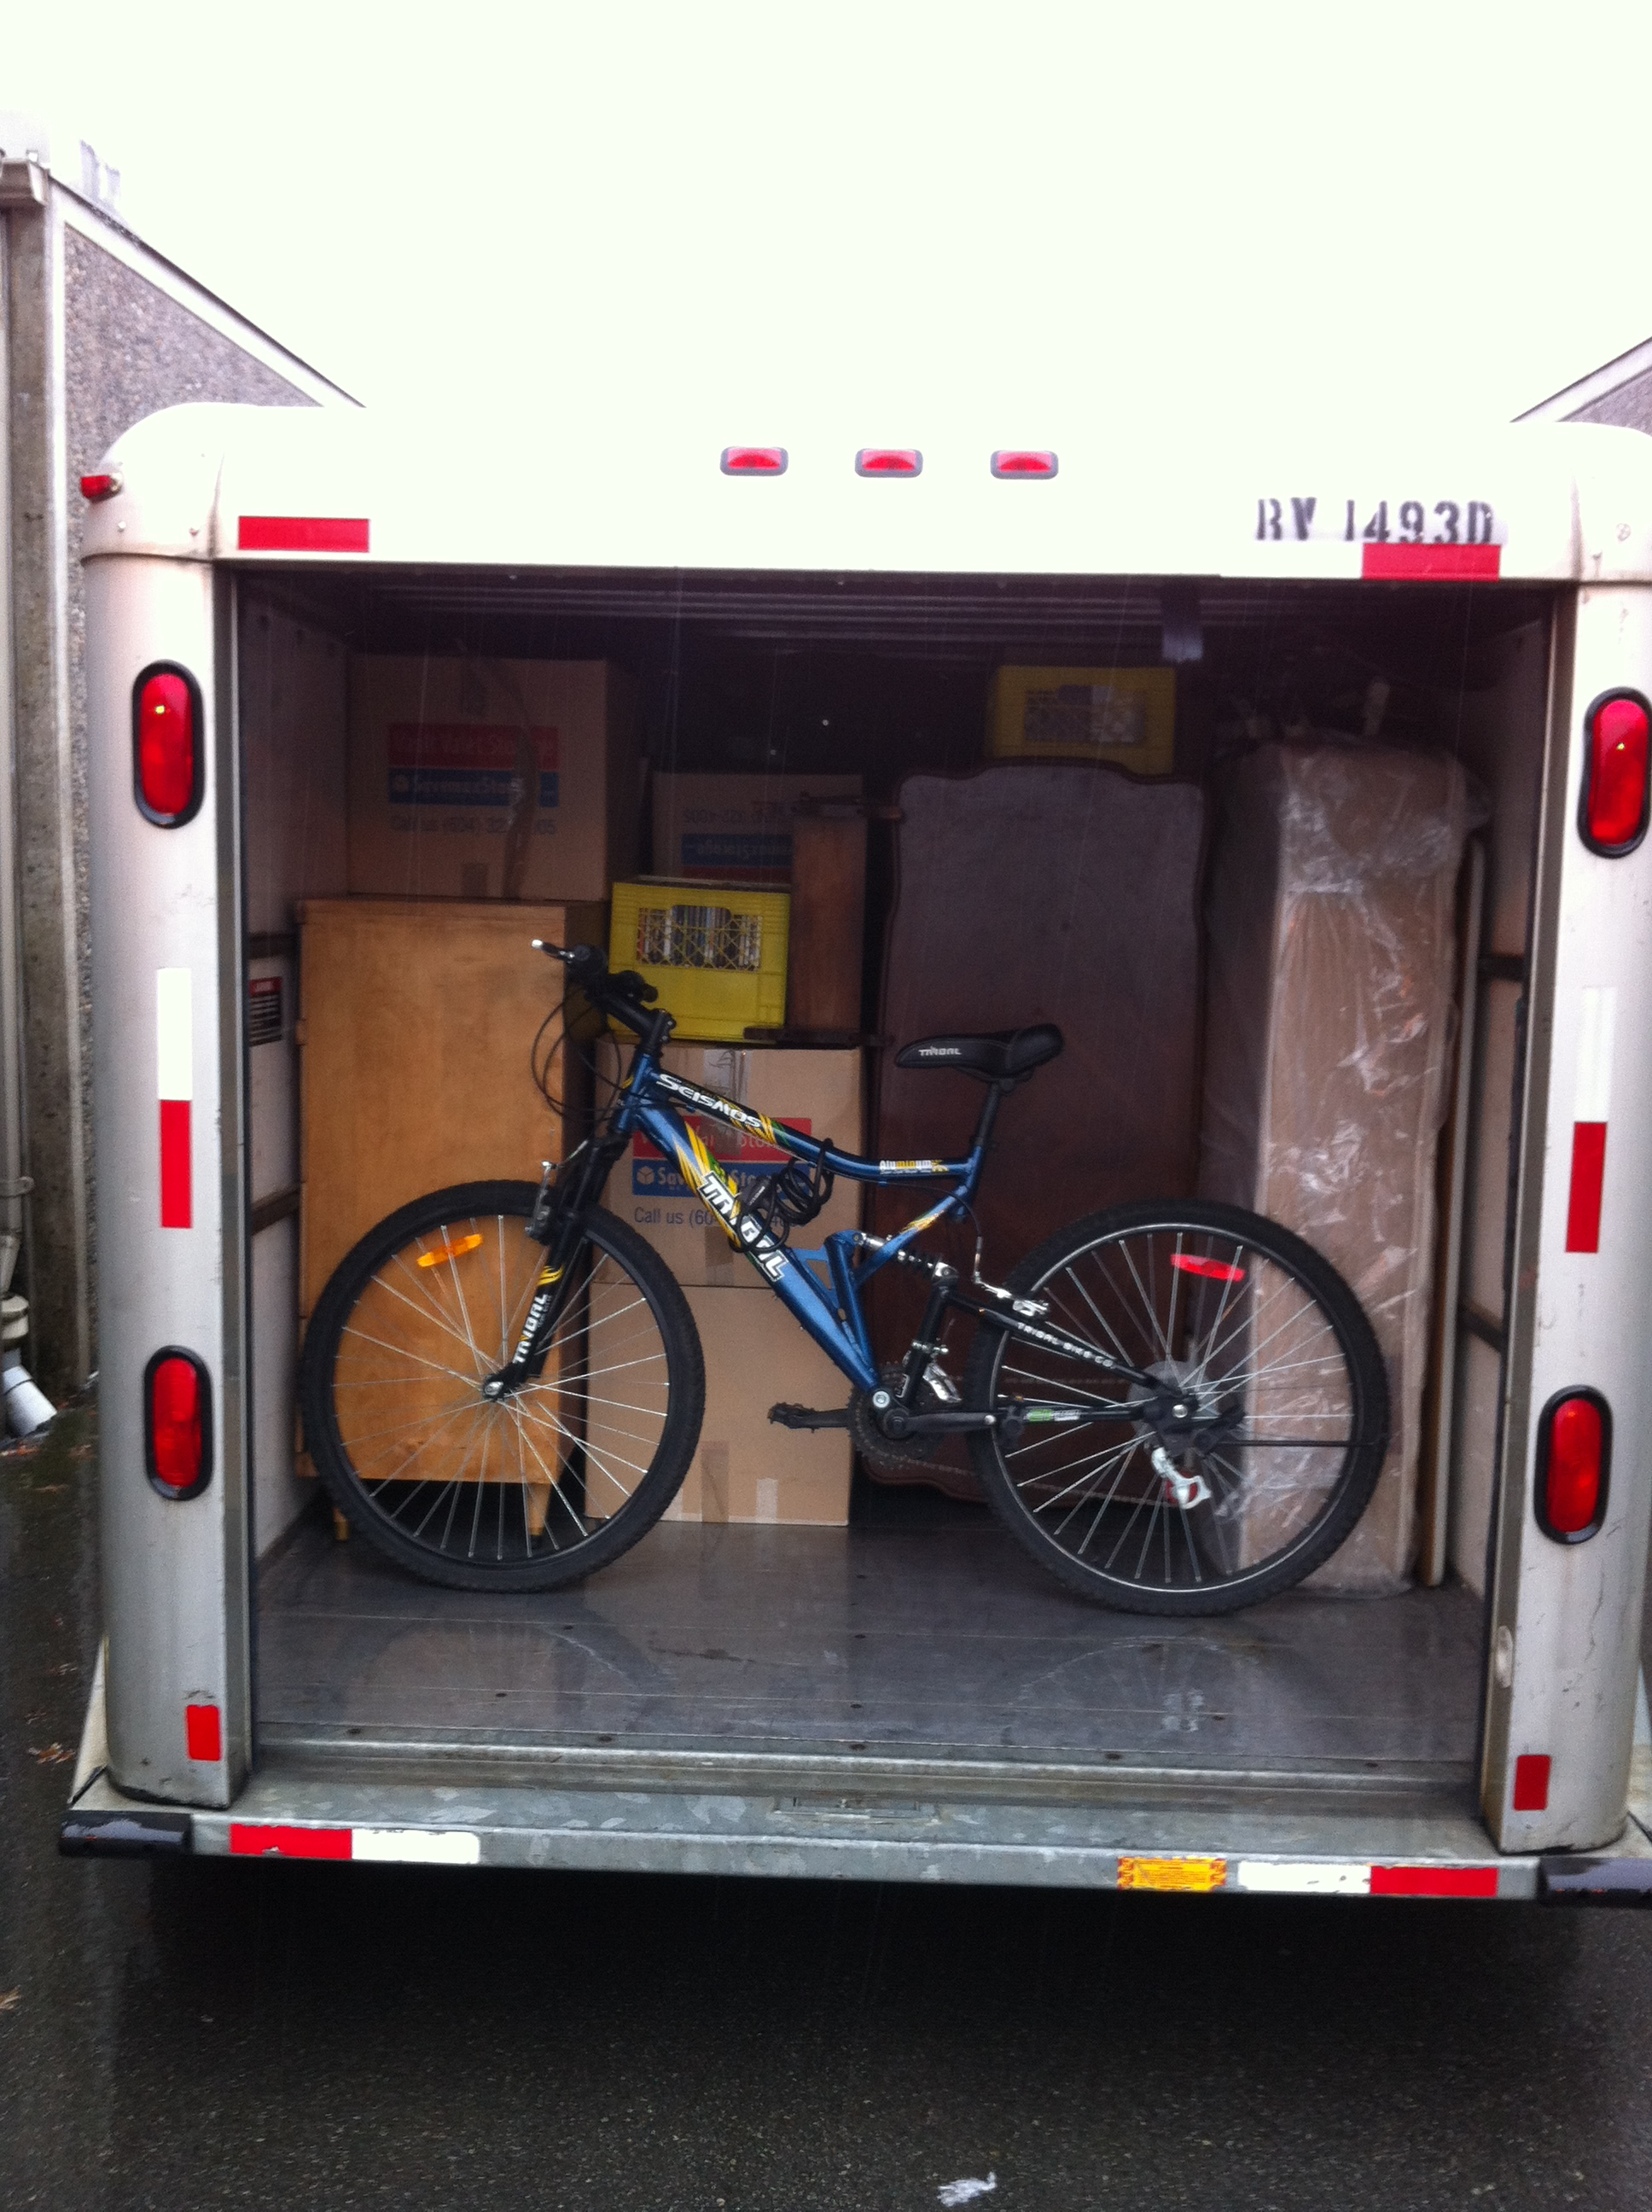 UHaul Truck Loading and Unloading Help | Sam's Small MovesSam's